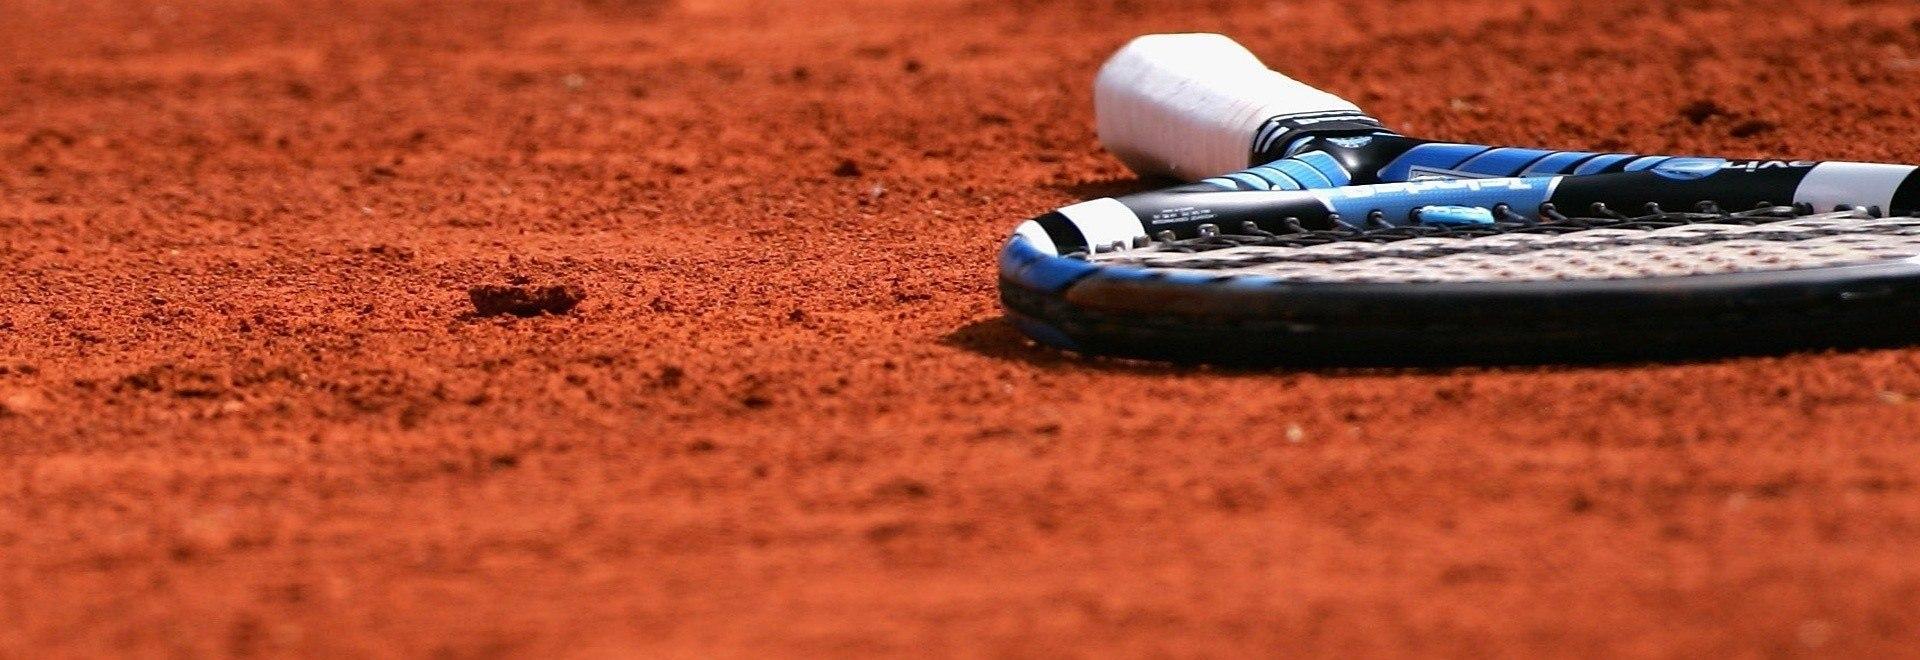 ATP World Tour Masters 1000 HL 2012 - Stag. 2012 - Shanghai